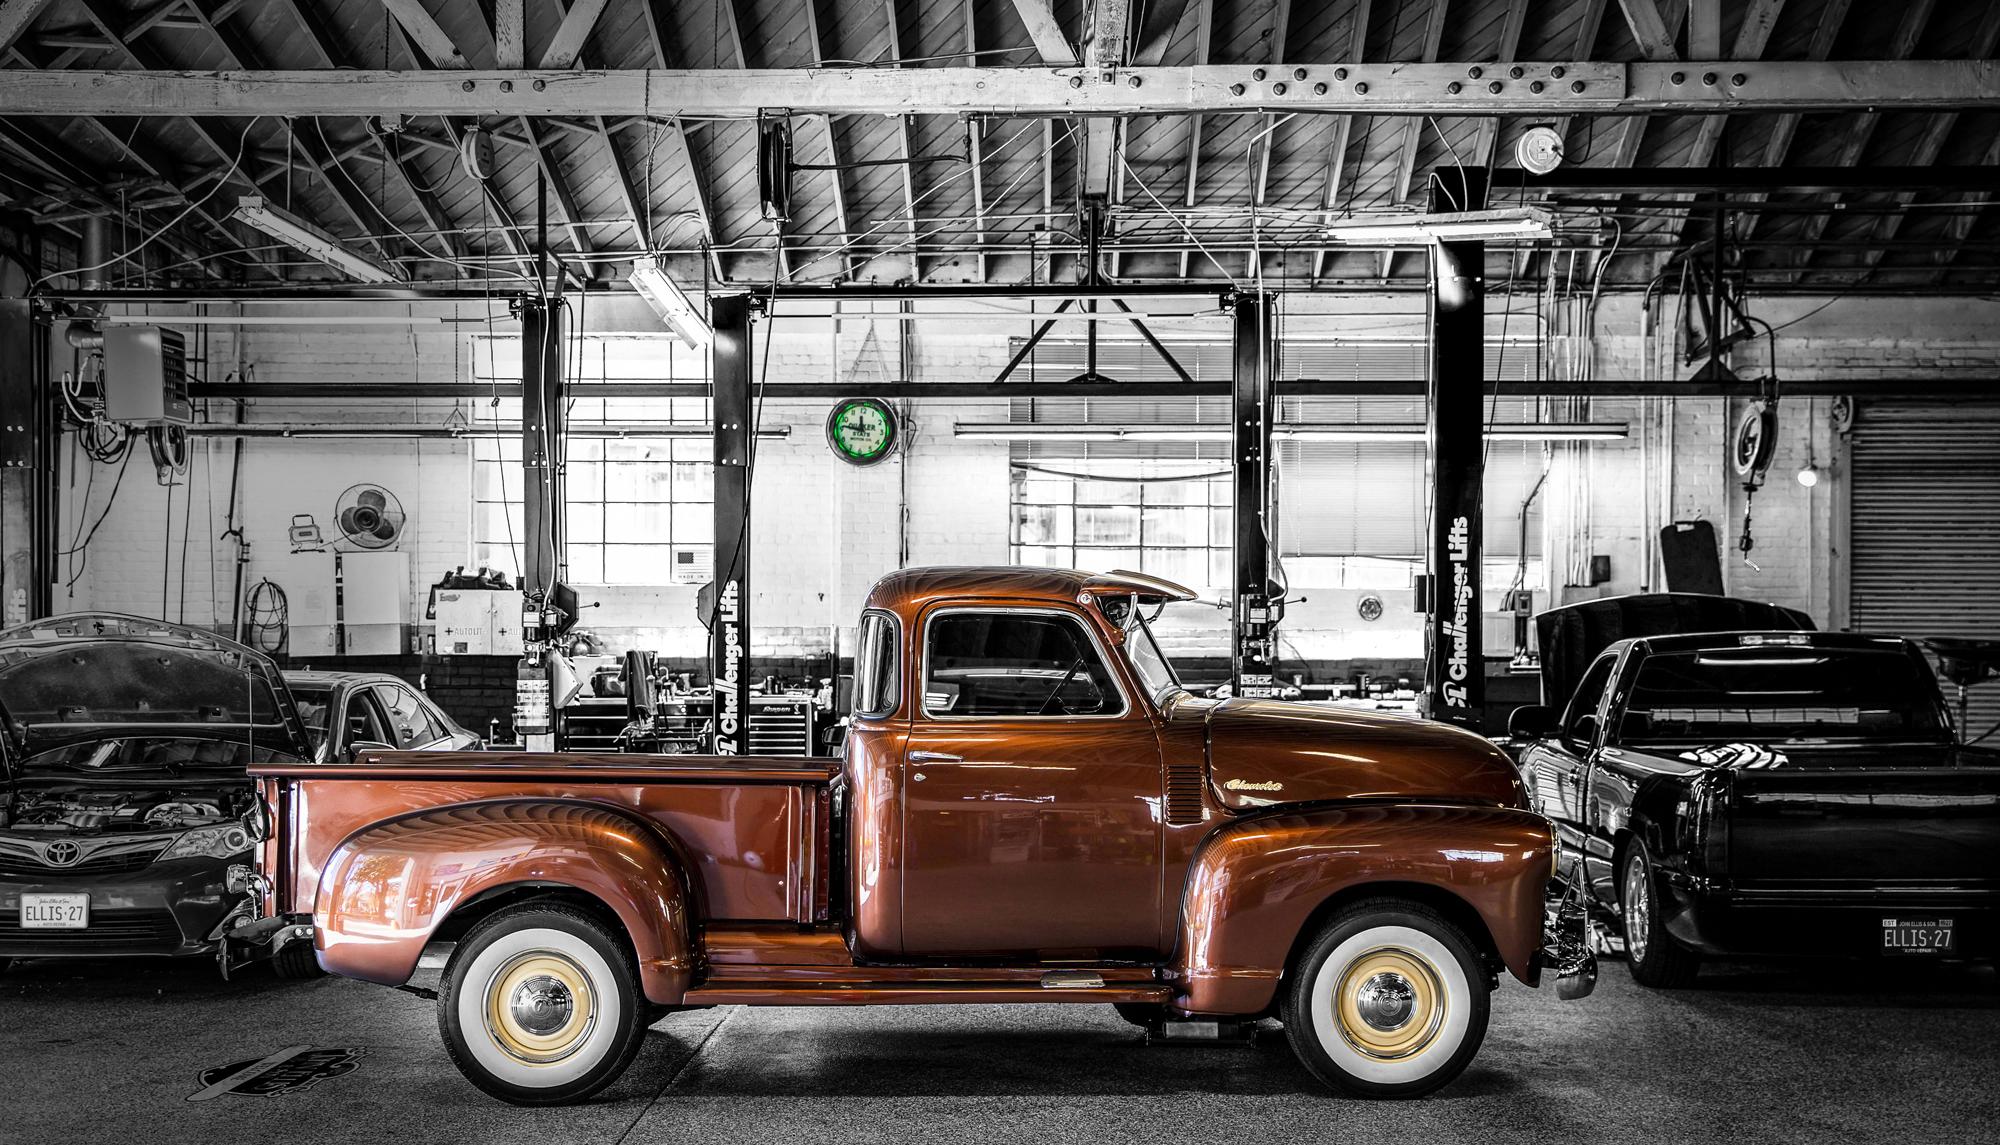 moxie-media-truck.jpg